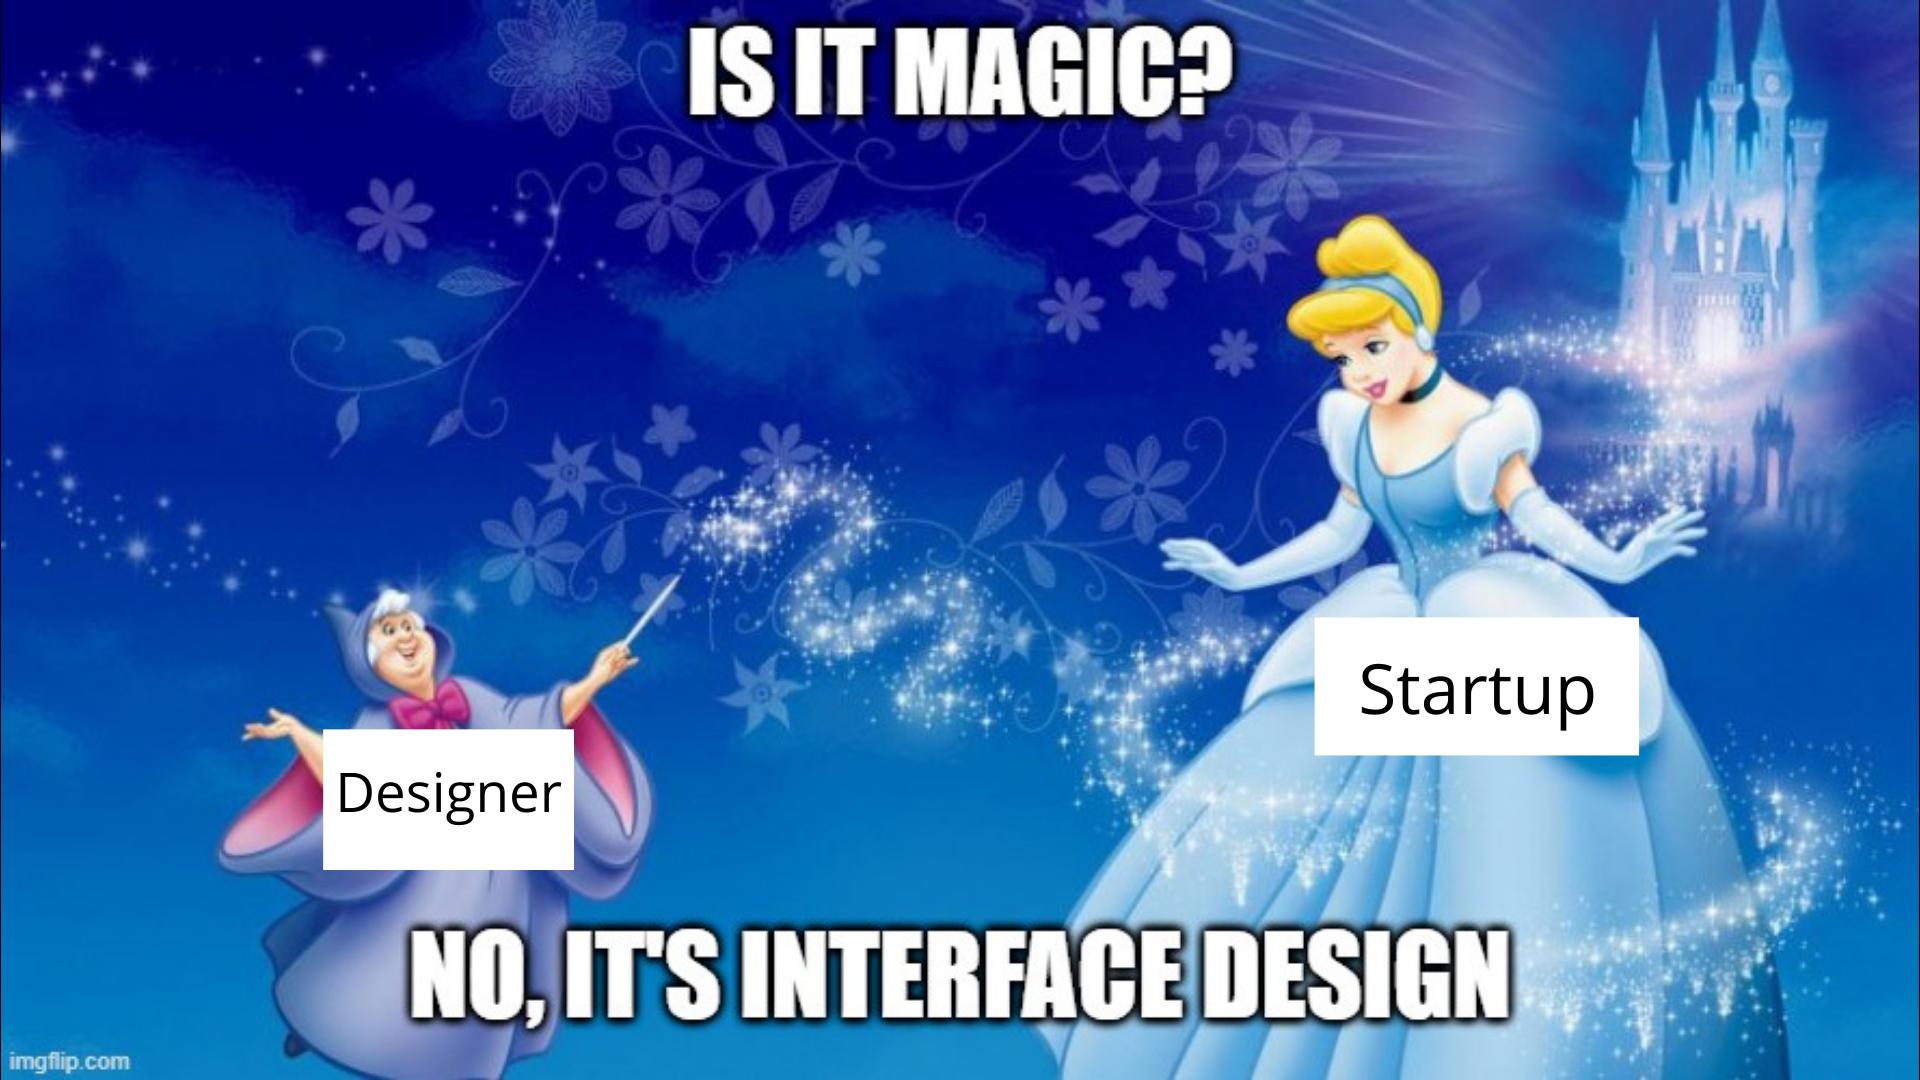 interface design meme